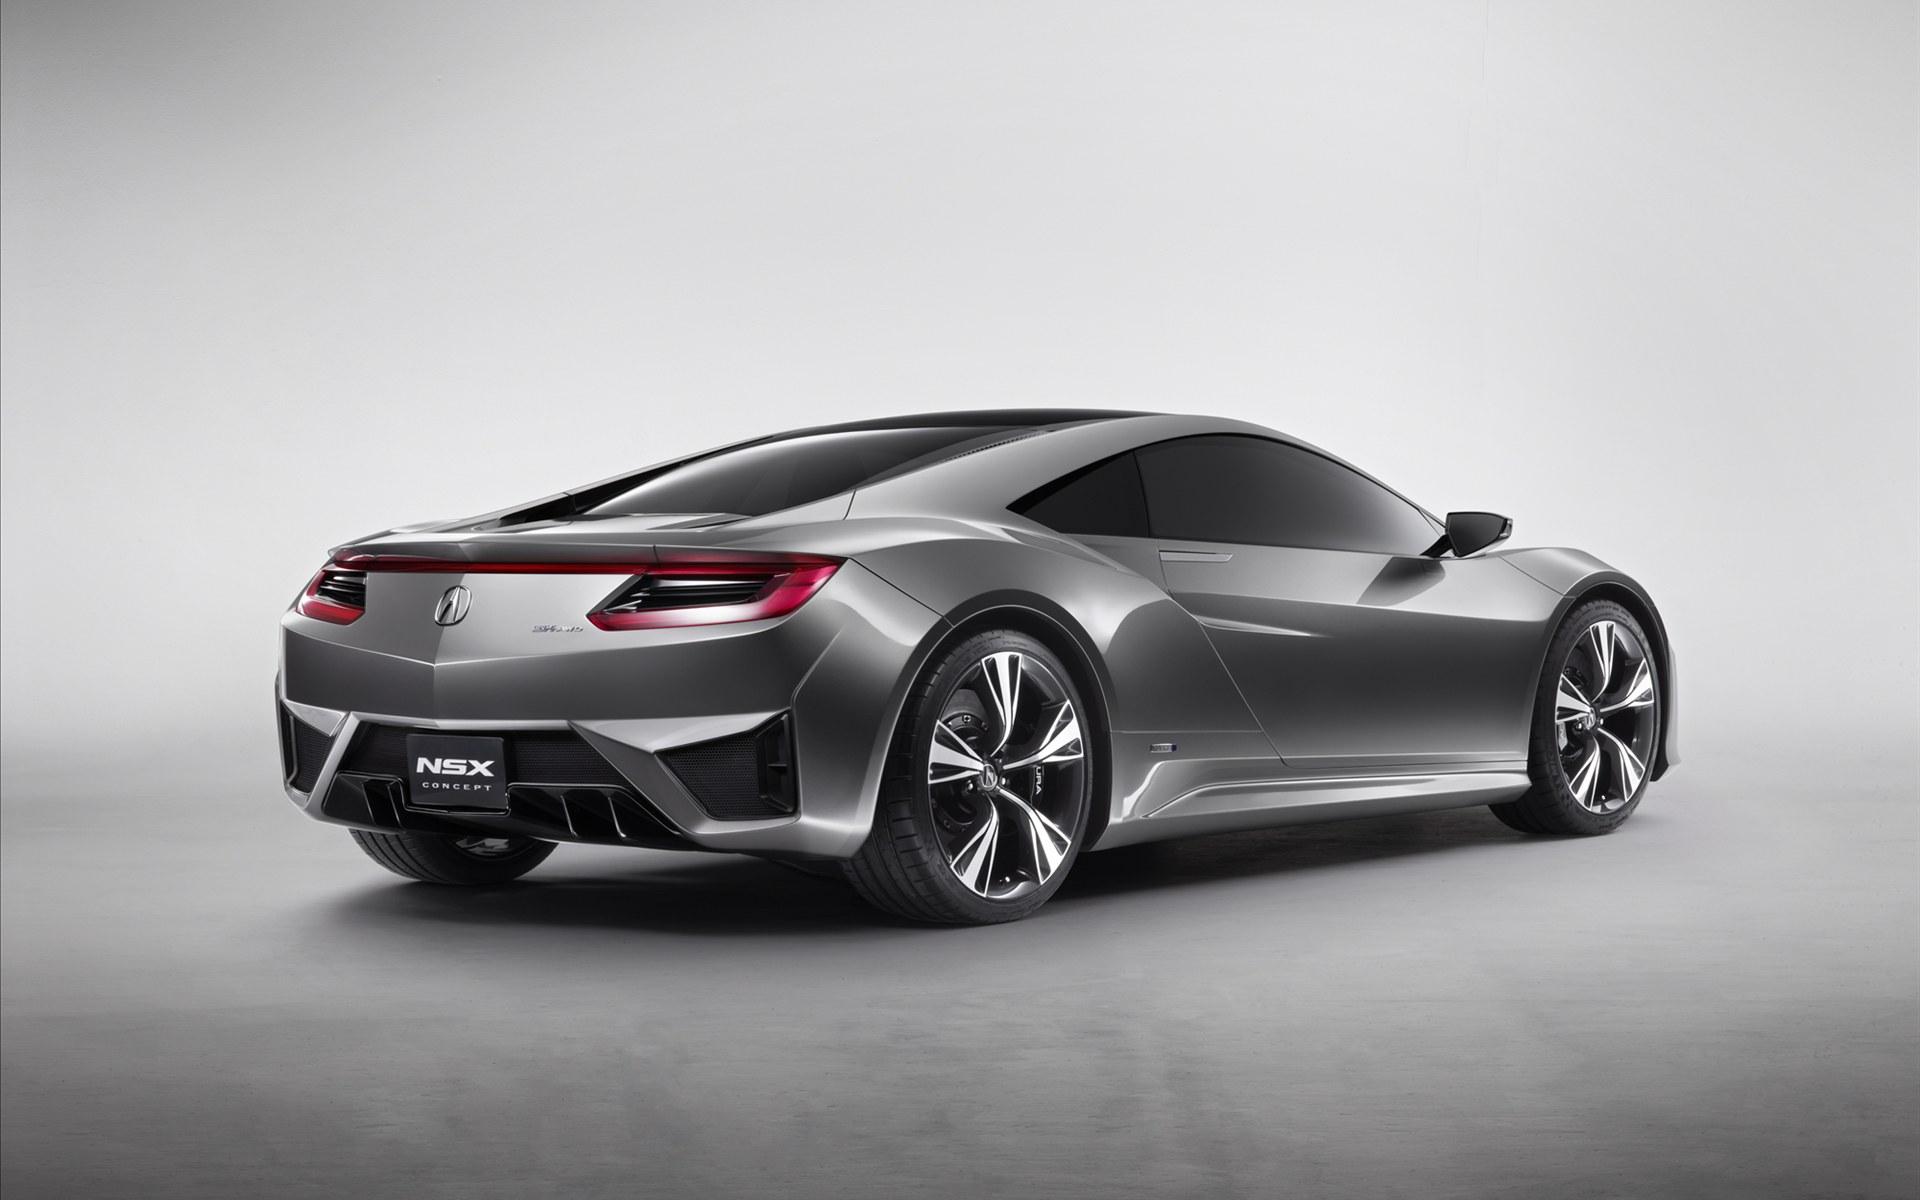 2013 Acura NSX Concept 3 Wallpaper | HD Car Wallpapers ...